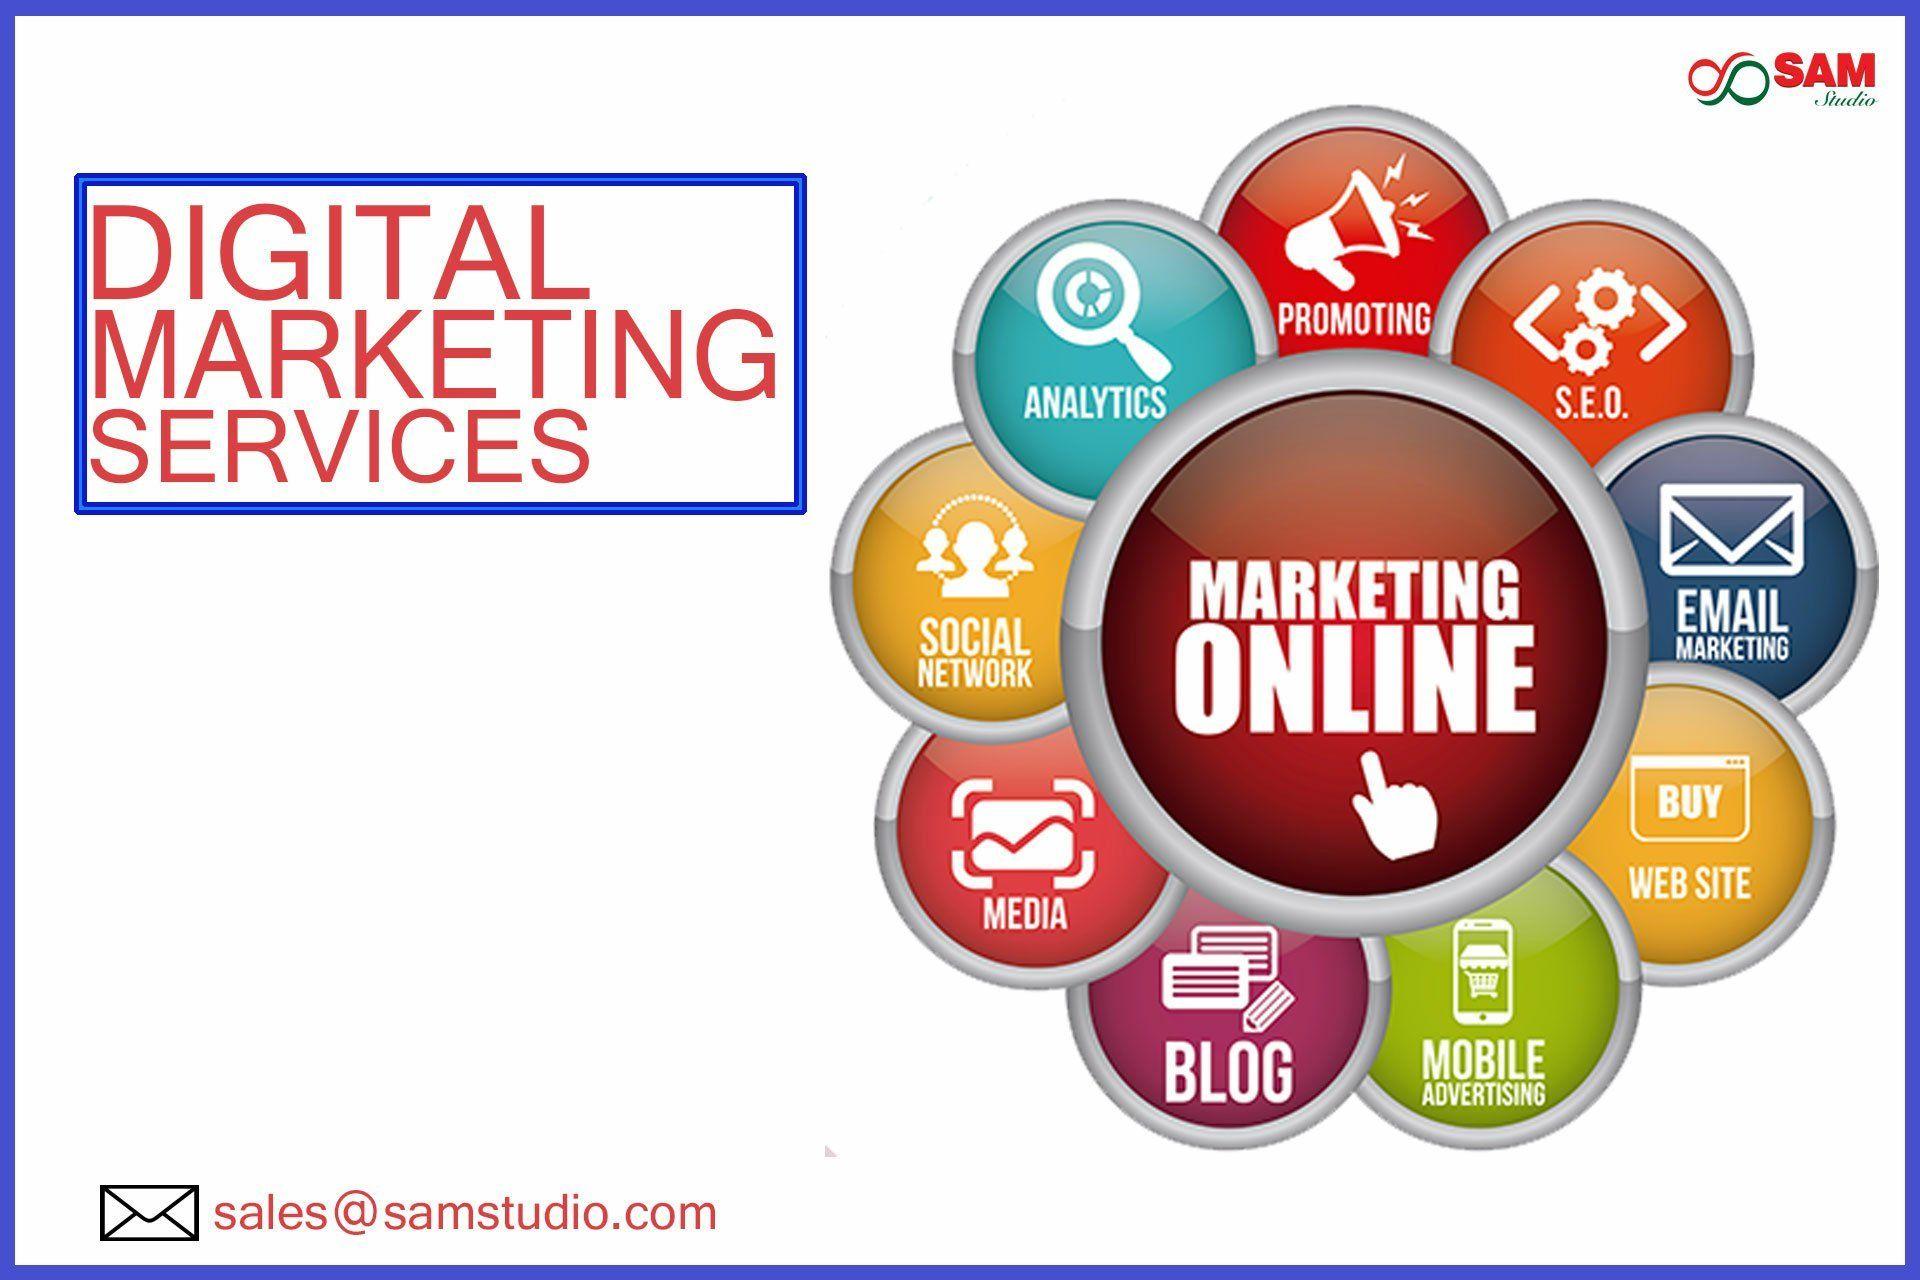 digital-marketing-services1-1-digital-marketing